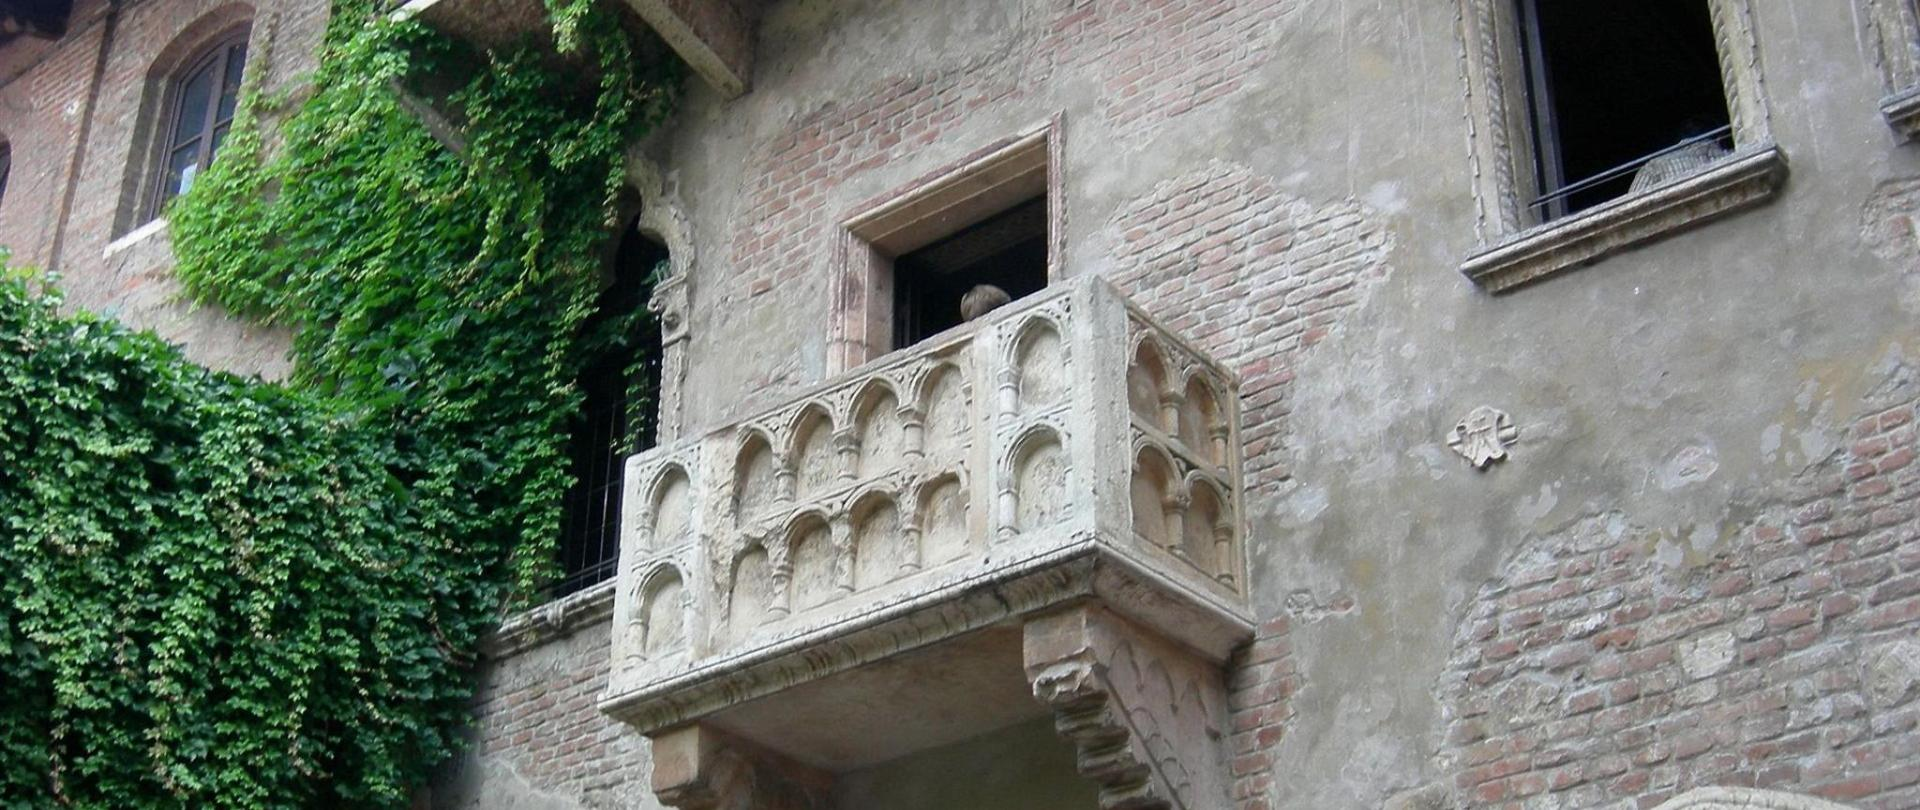 casa_di_giulietta_-Verona -_-_ balcony.jpg